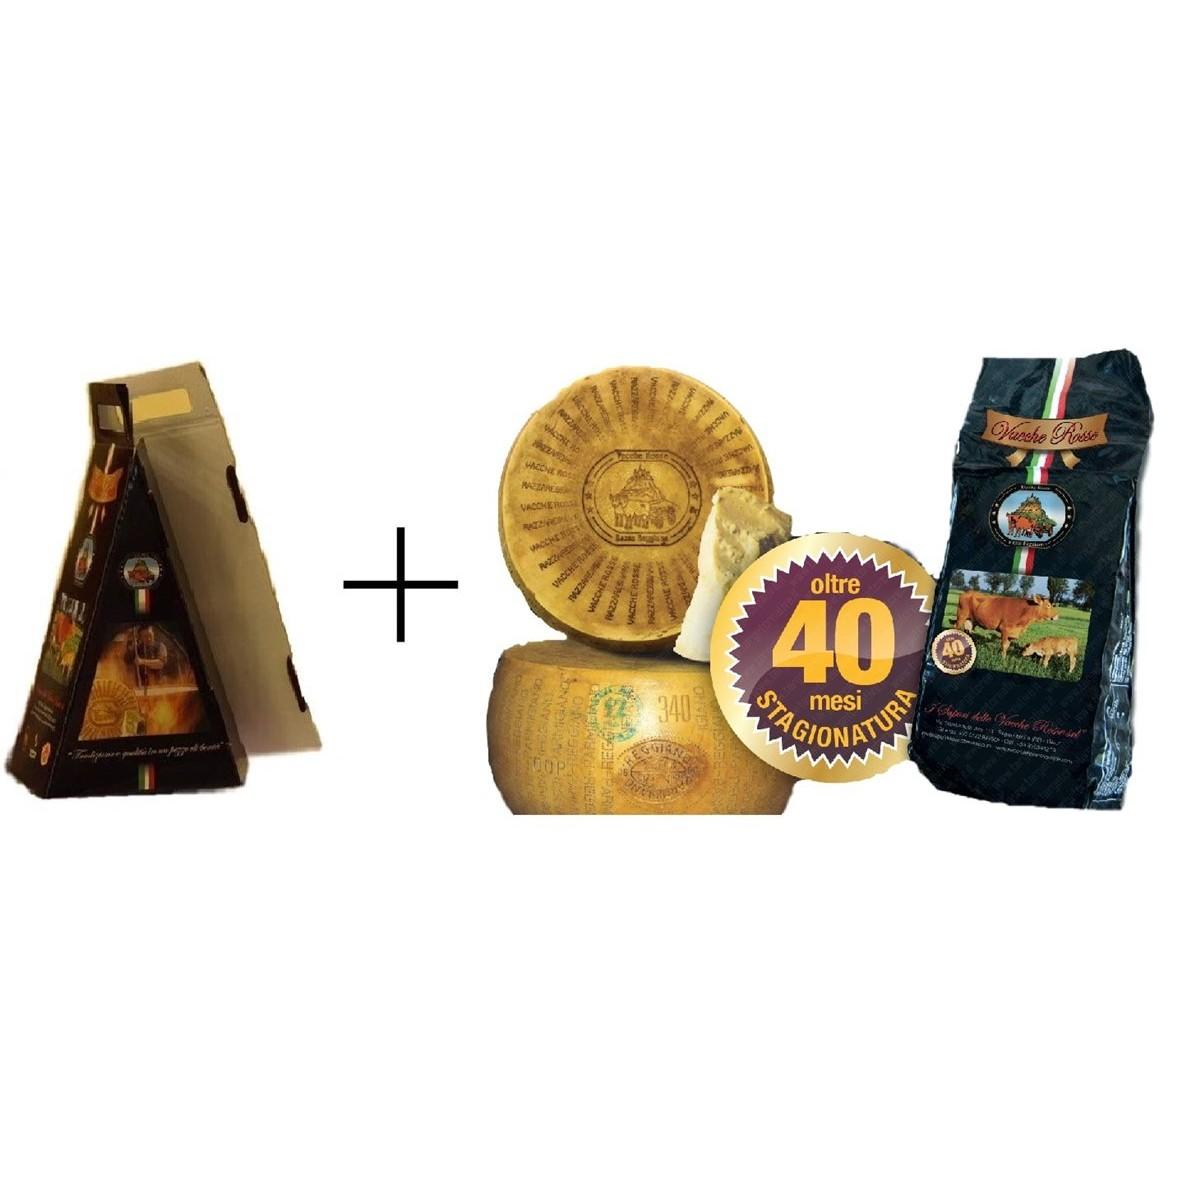 2 Gift BOXES (2 x 0,5Kg) - Parmigiano Reggiano Vacche Rosse Vacuum 0,5 Kg - Over 40 Months RI